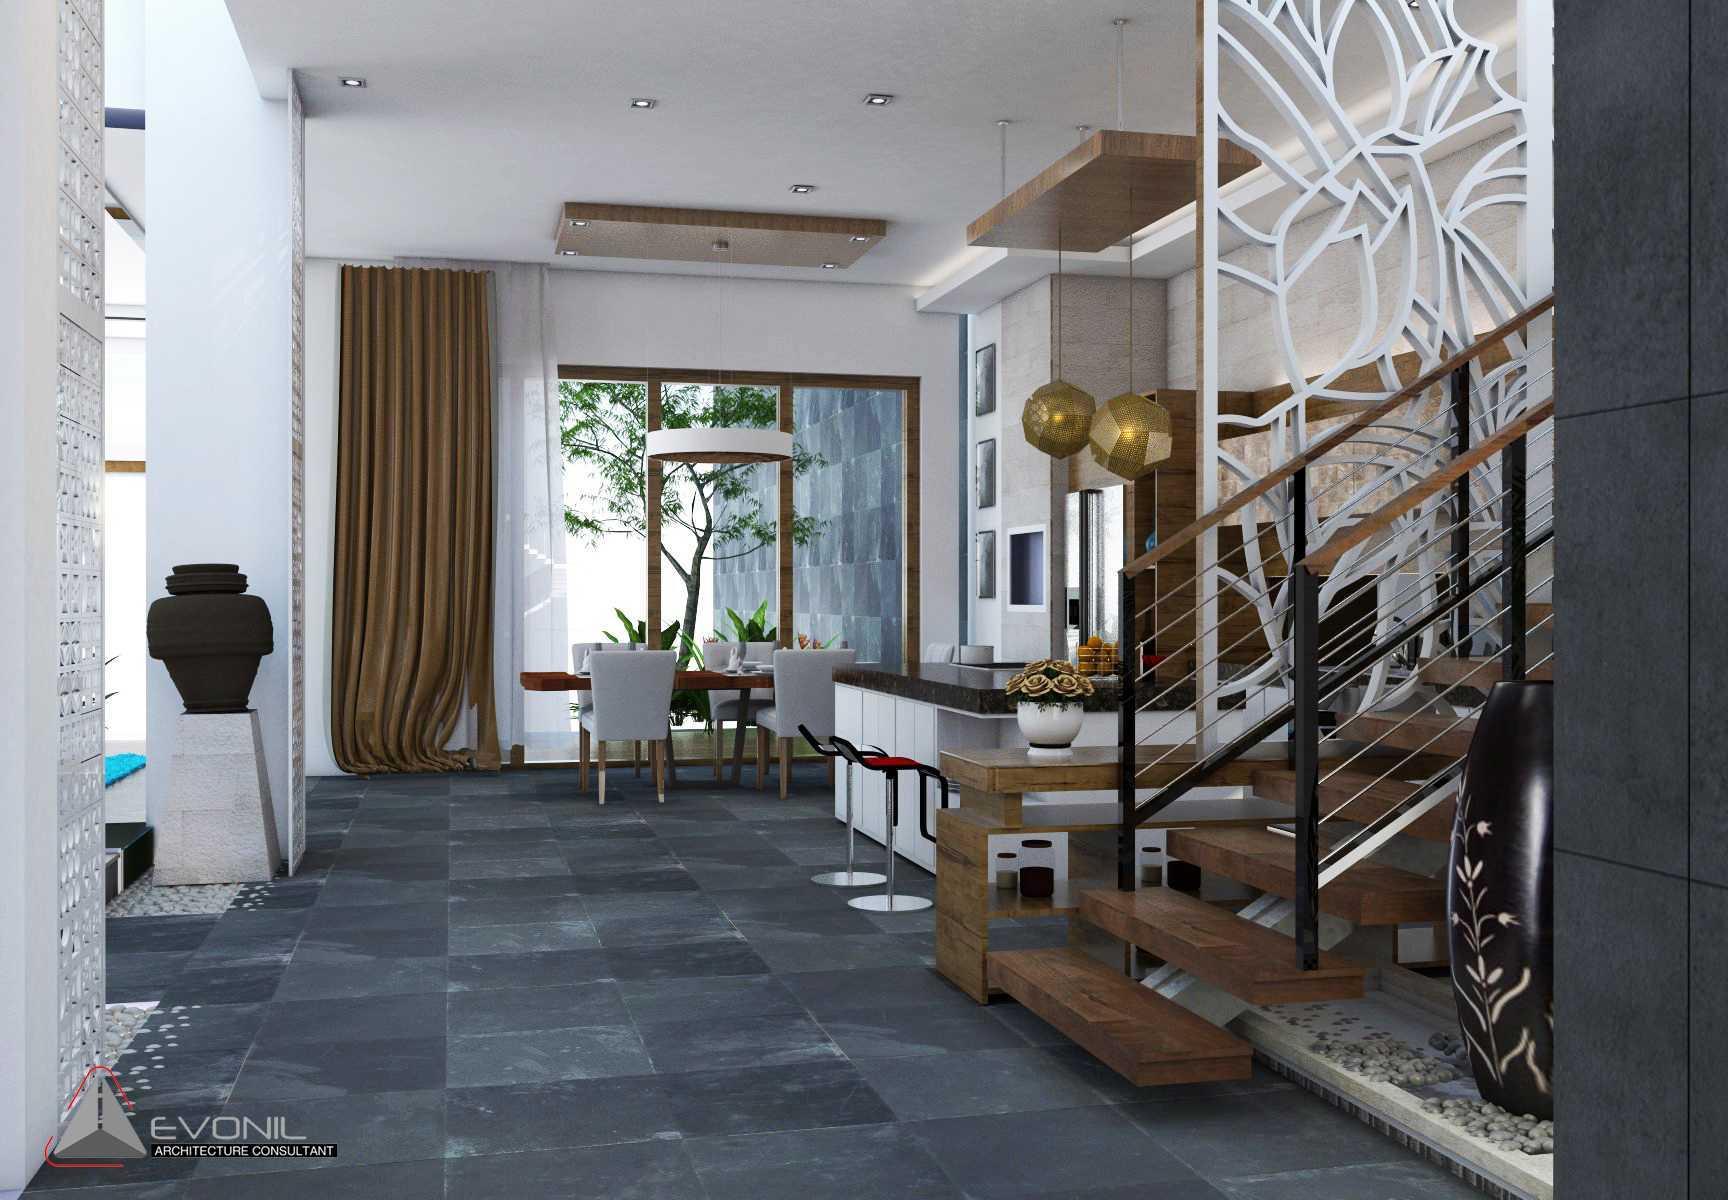 Evonil Architecture Residence Jatiwaringin Jatiwaringin, Jakarta Jatiwaringin, Jakarta Tangga-View-1-Residence-Jatiwaringin Tradisional  13081